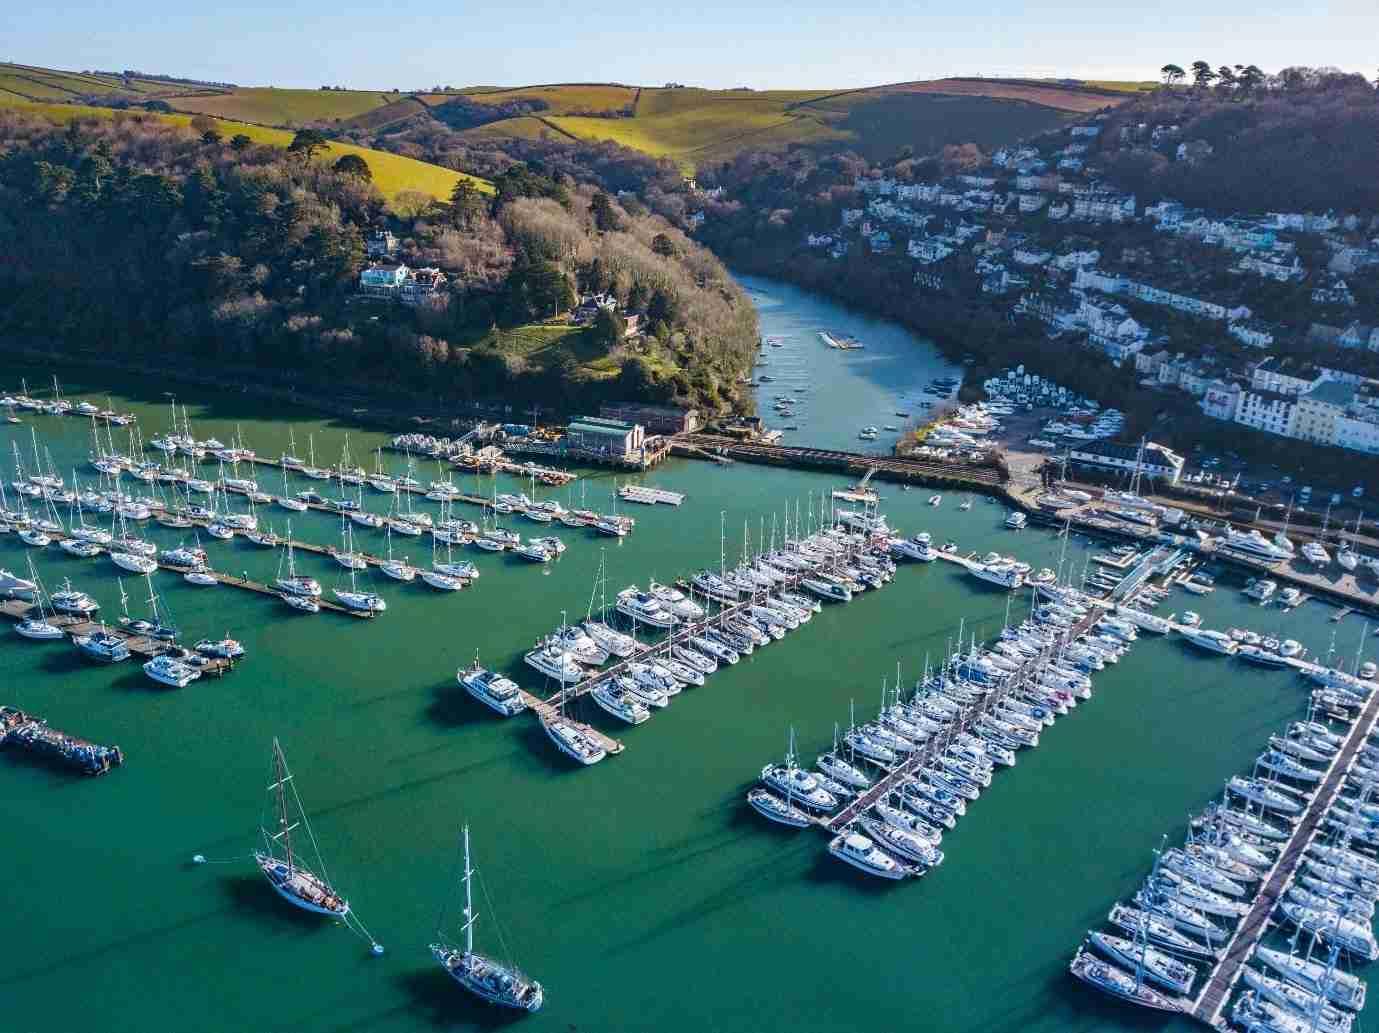 South Coast hotspots: Exe Estuary